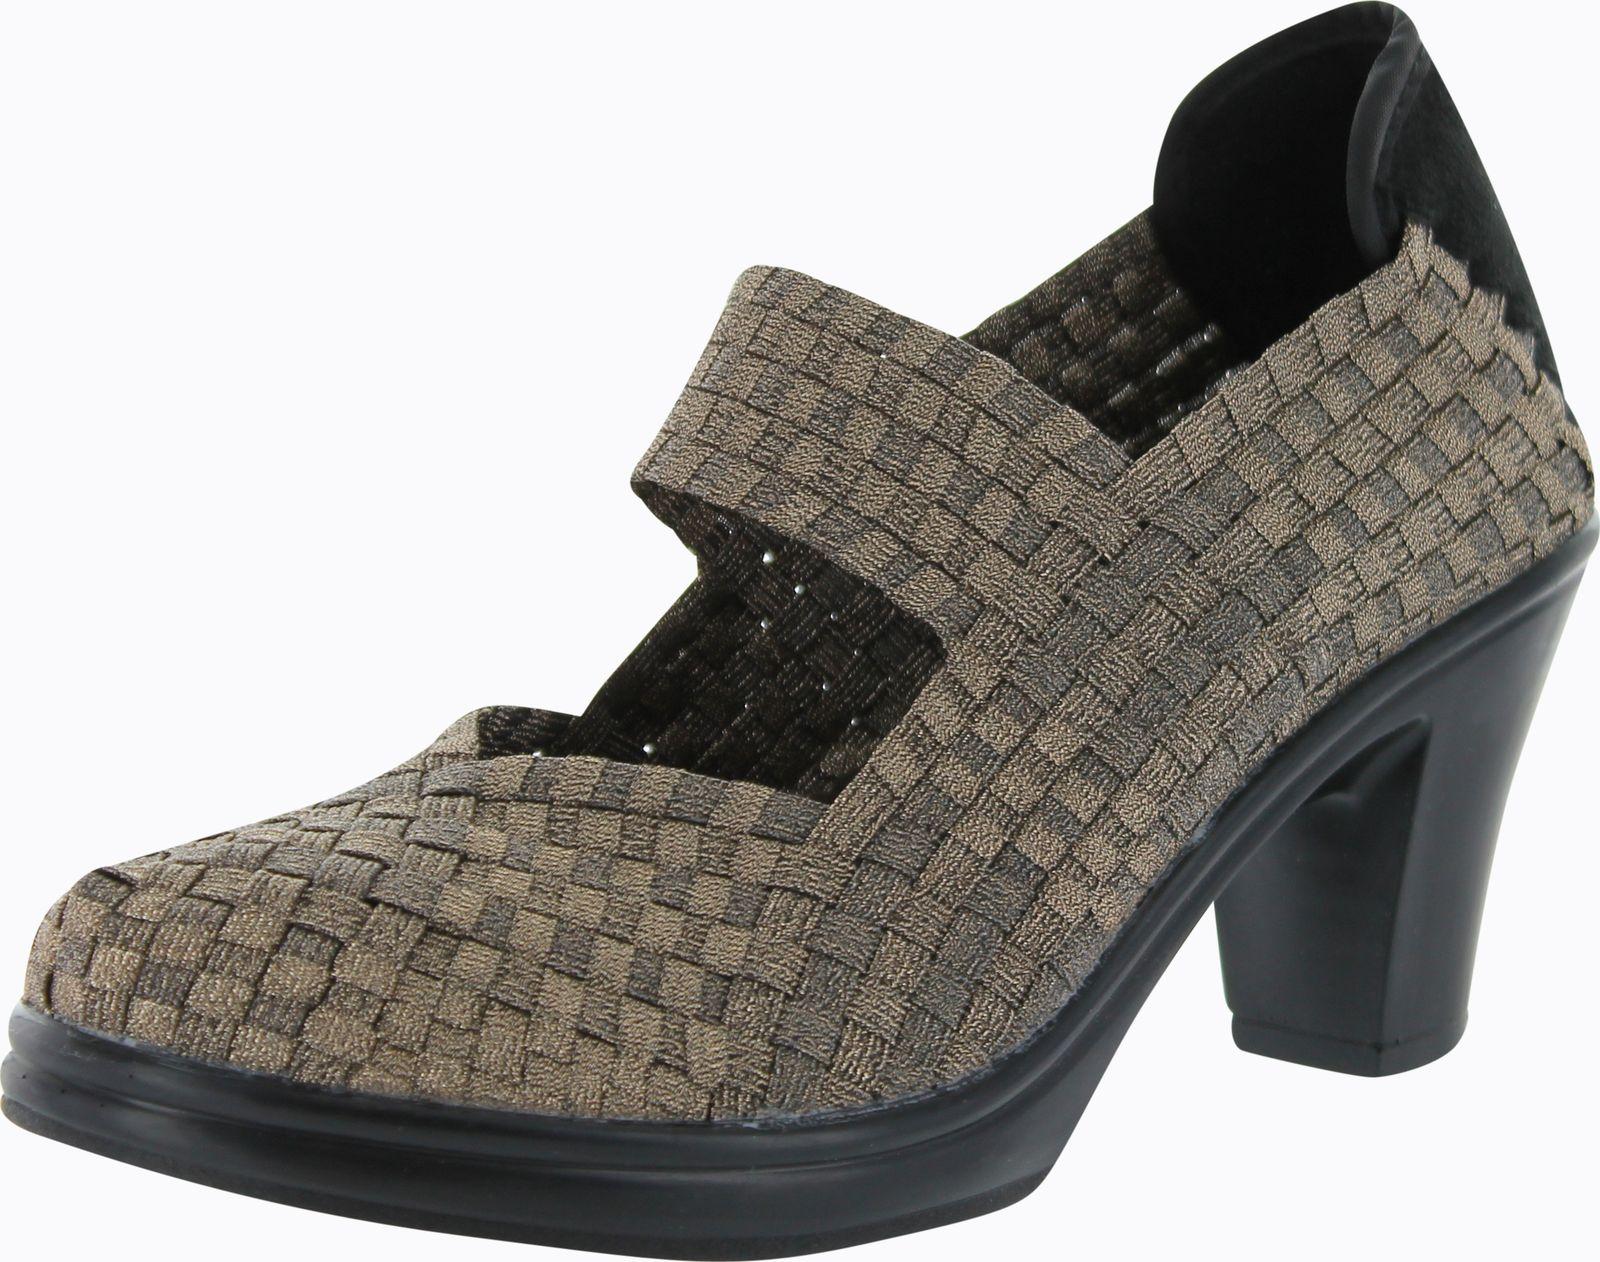 bernie mev womens bonnie pumps shoes ebay